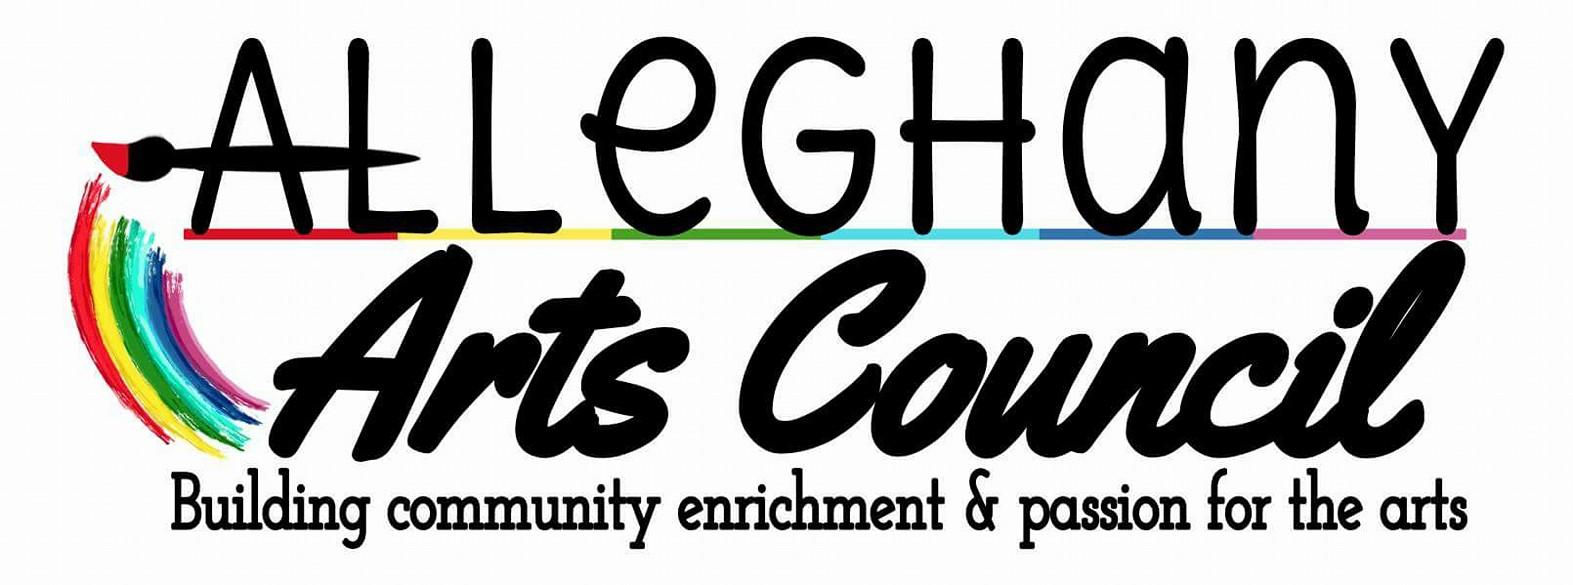 Alleghany Arts Council Logo.jpg